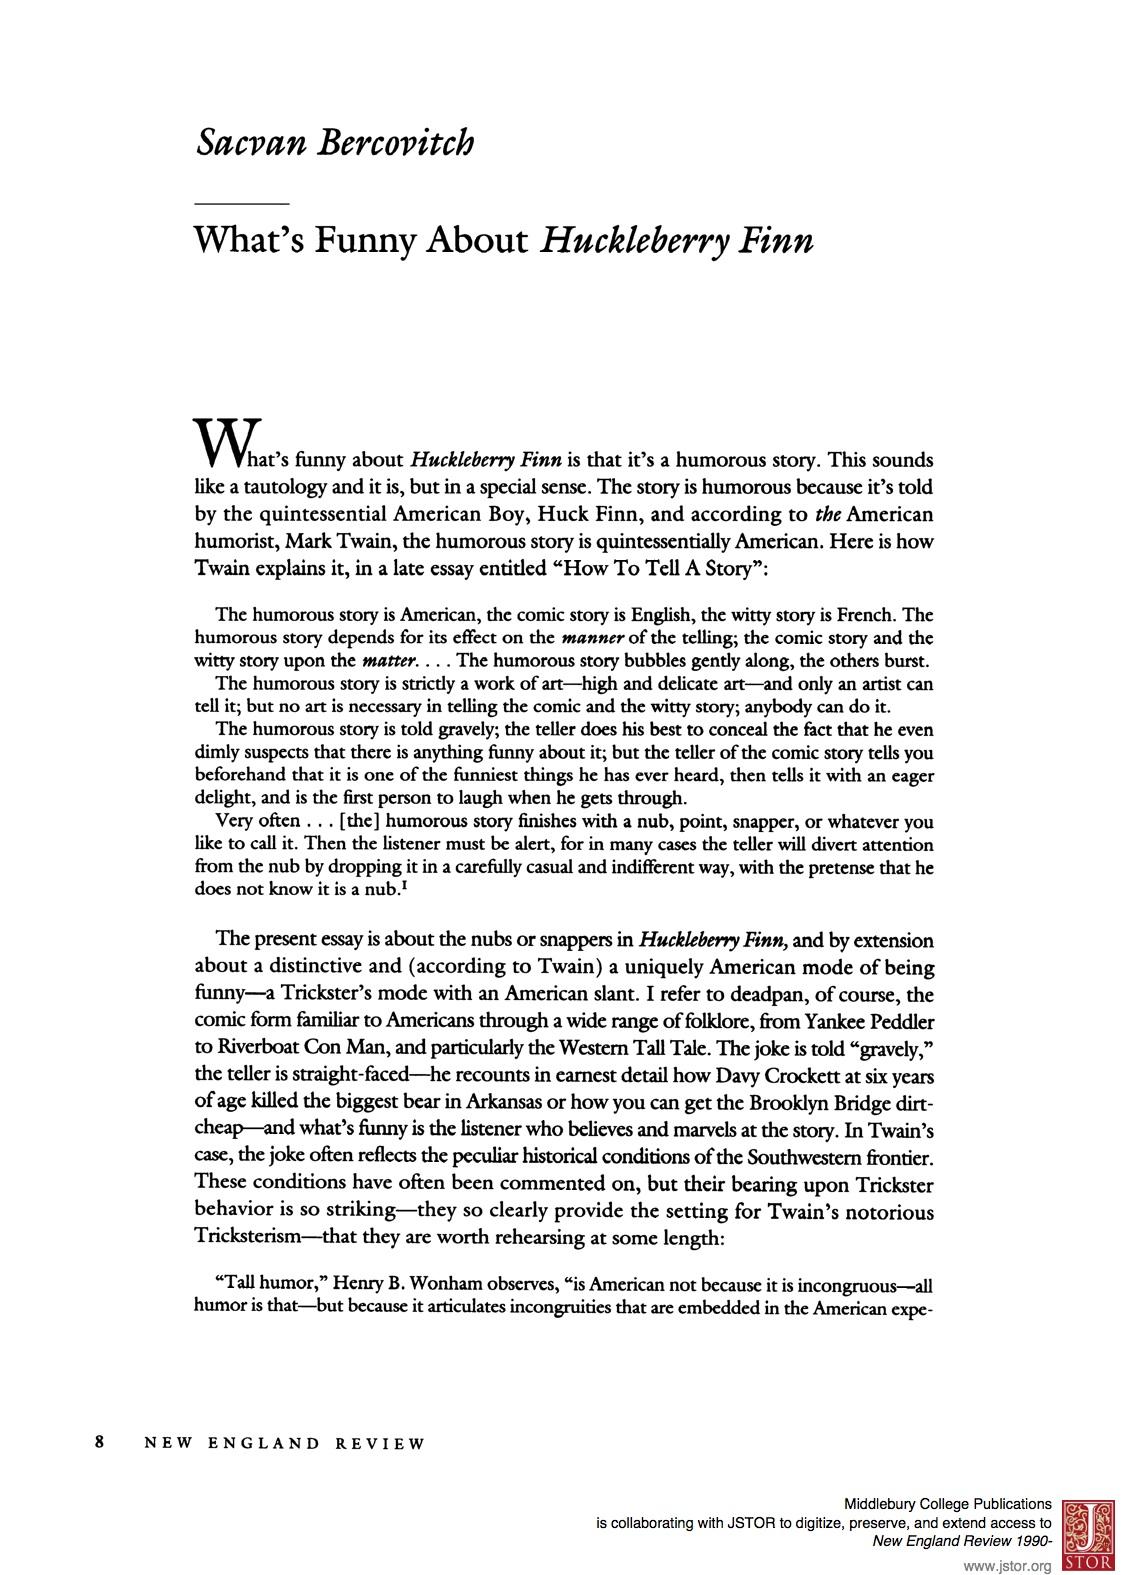 Huckleberry Finn Essay Huckleberry Finn Essay The